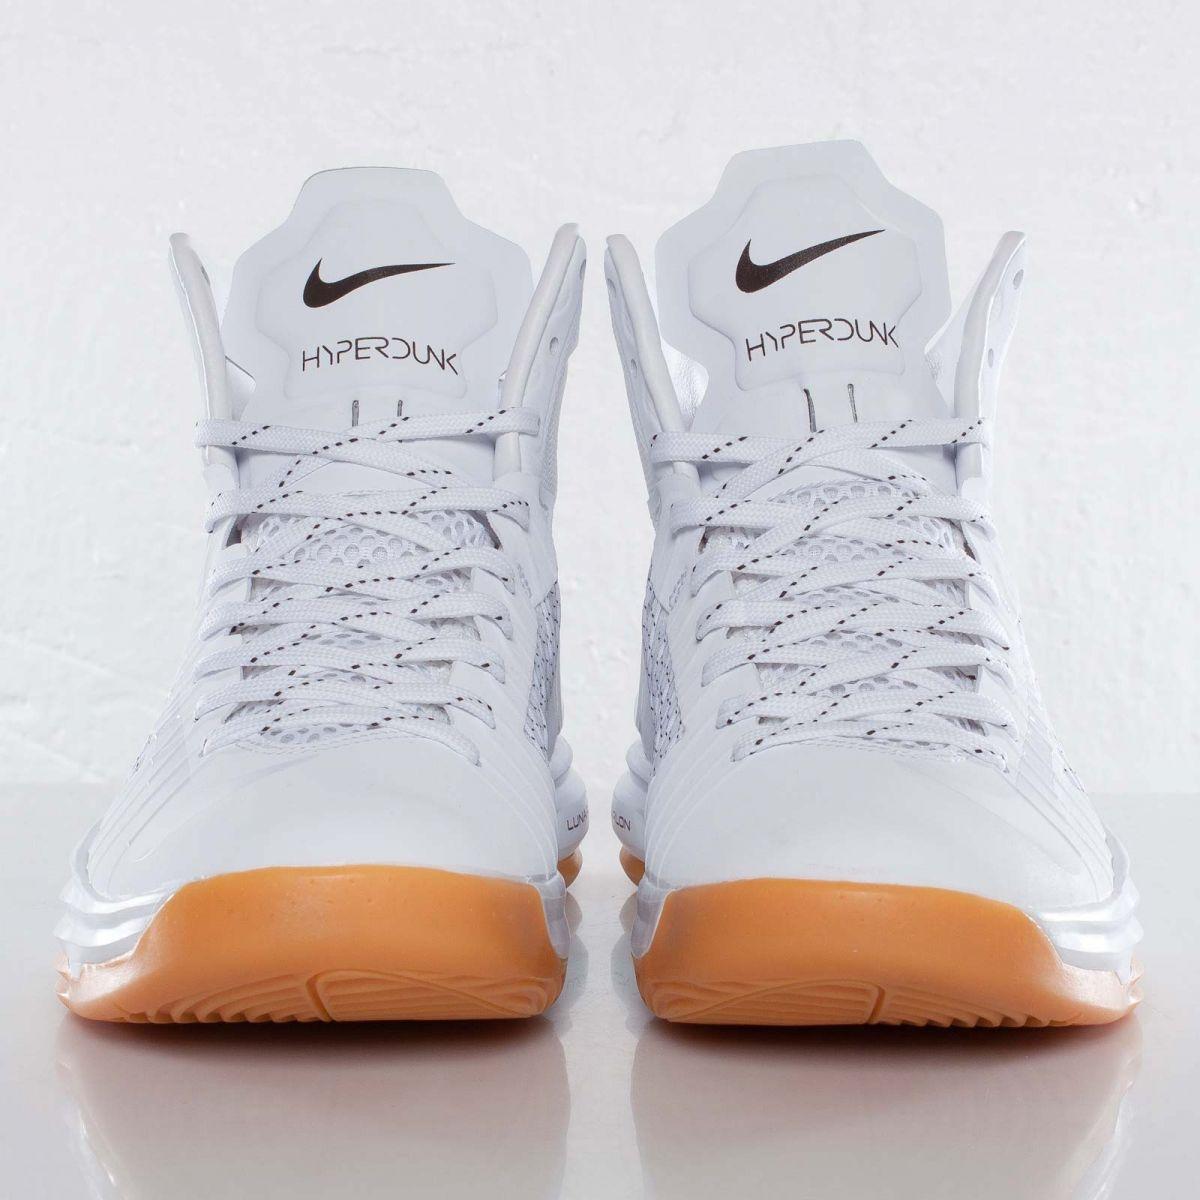 5d9a4f484529 Undefeated x Nike Hyperdunk 2012 -